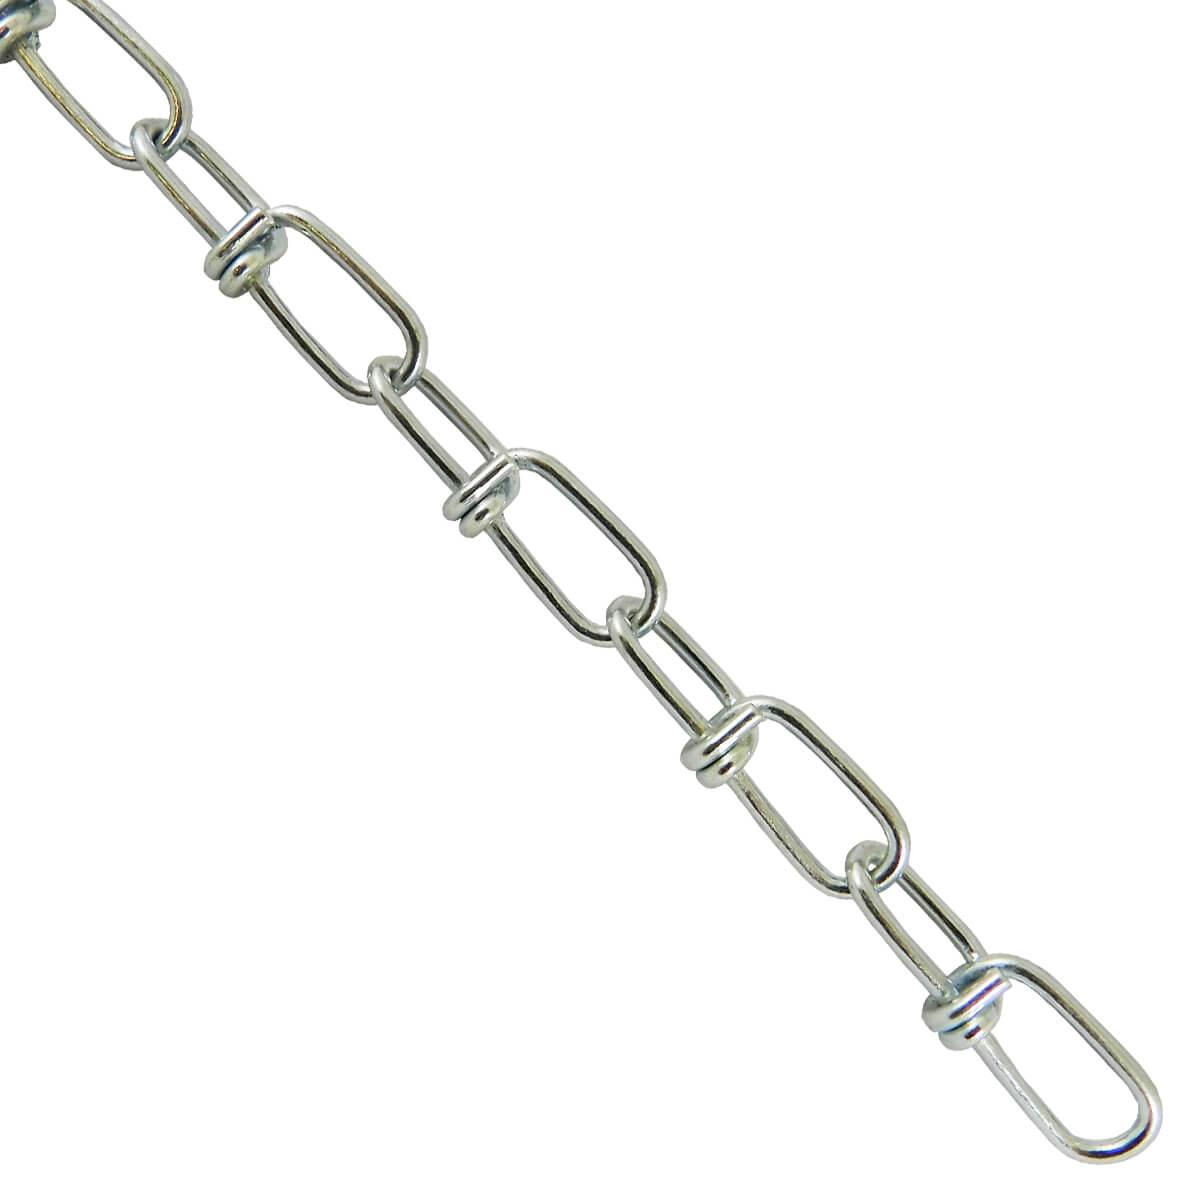 Double Loop Chain - #3 - Price / ft